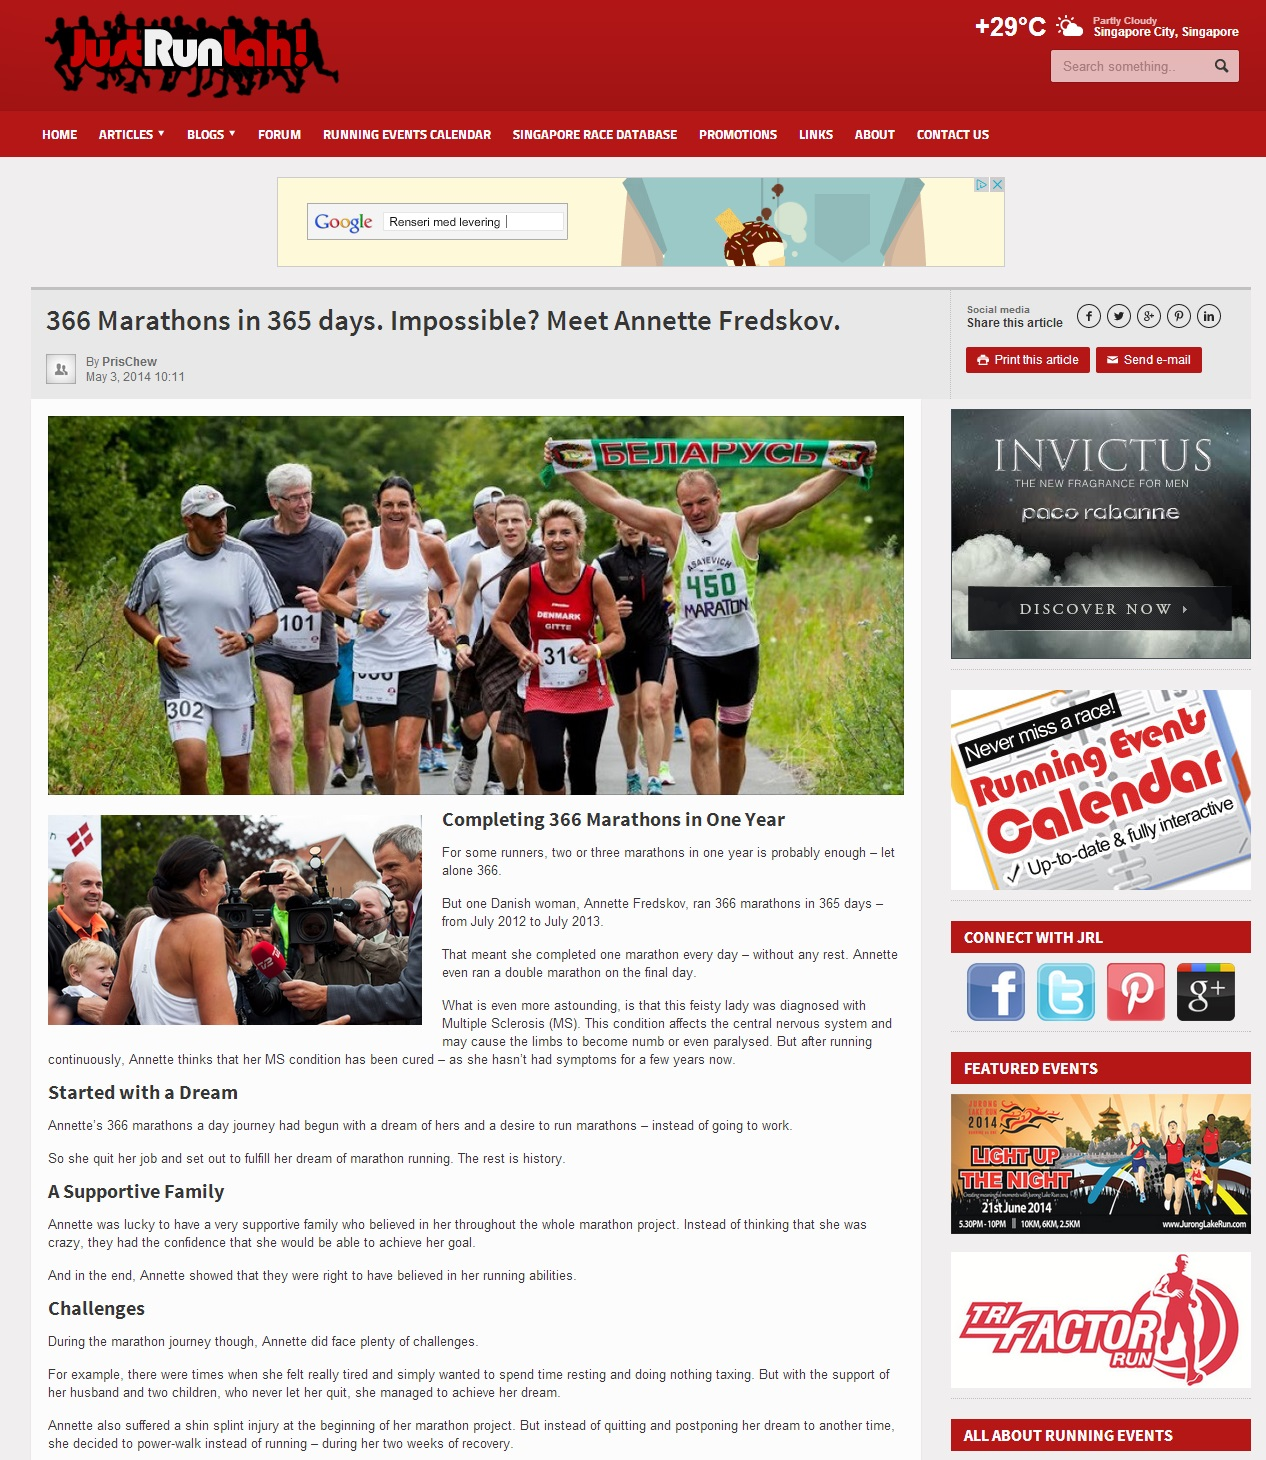 justrunlah.com 2014.05.03